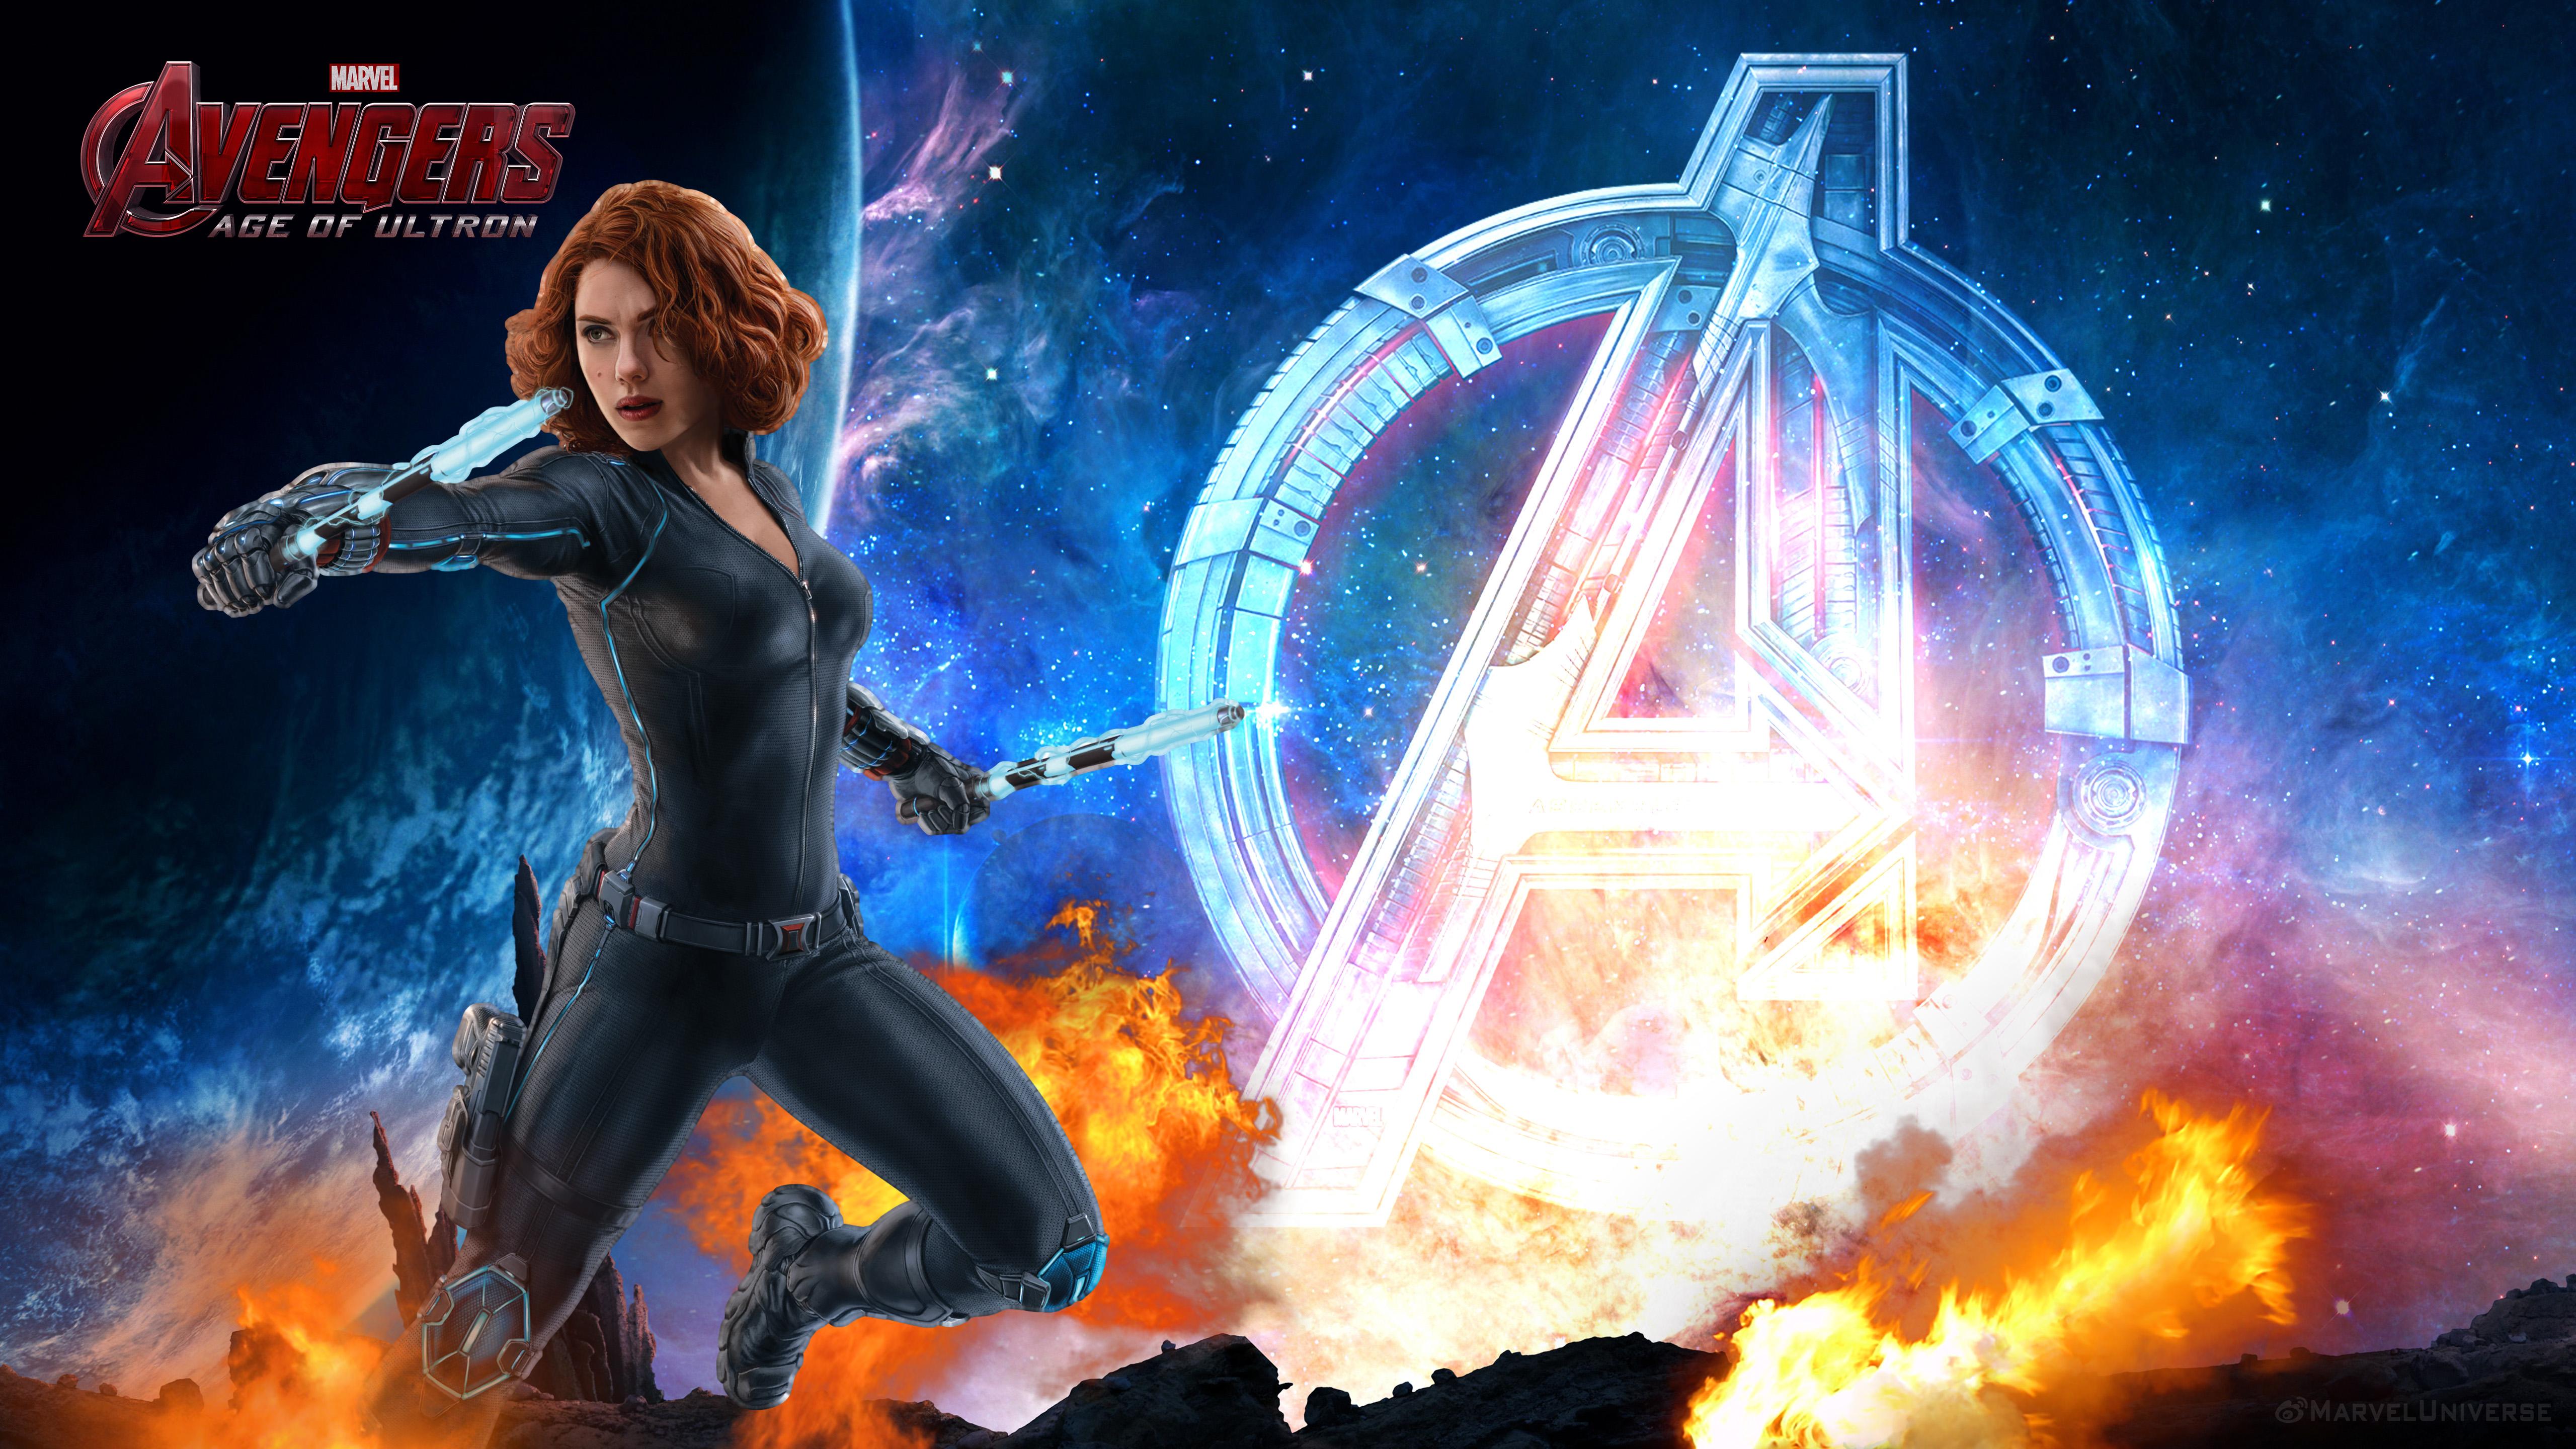 Avengers Age of Ultron wallpaper 22